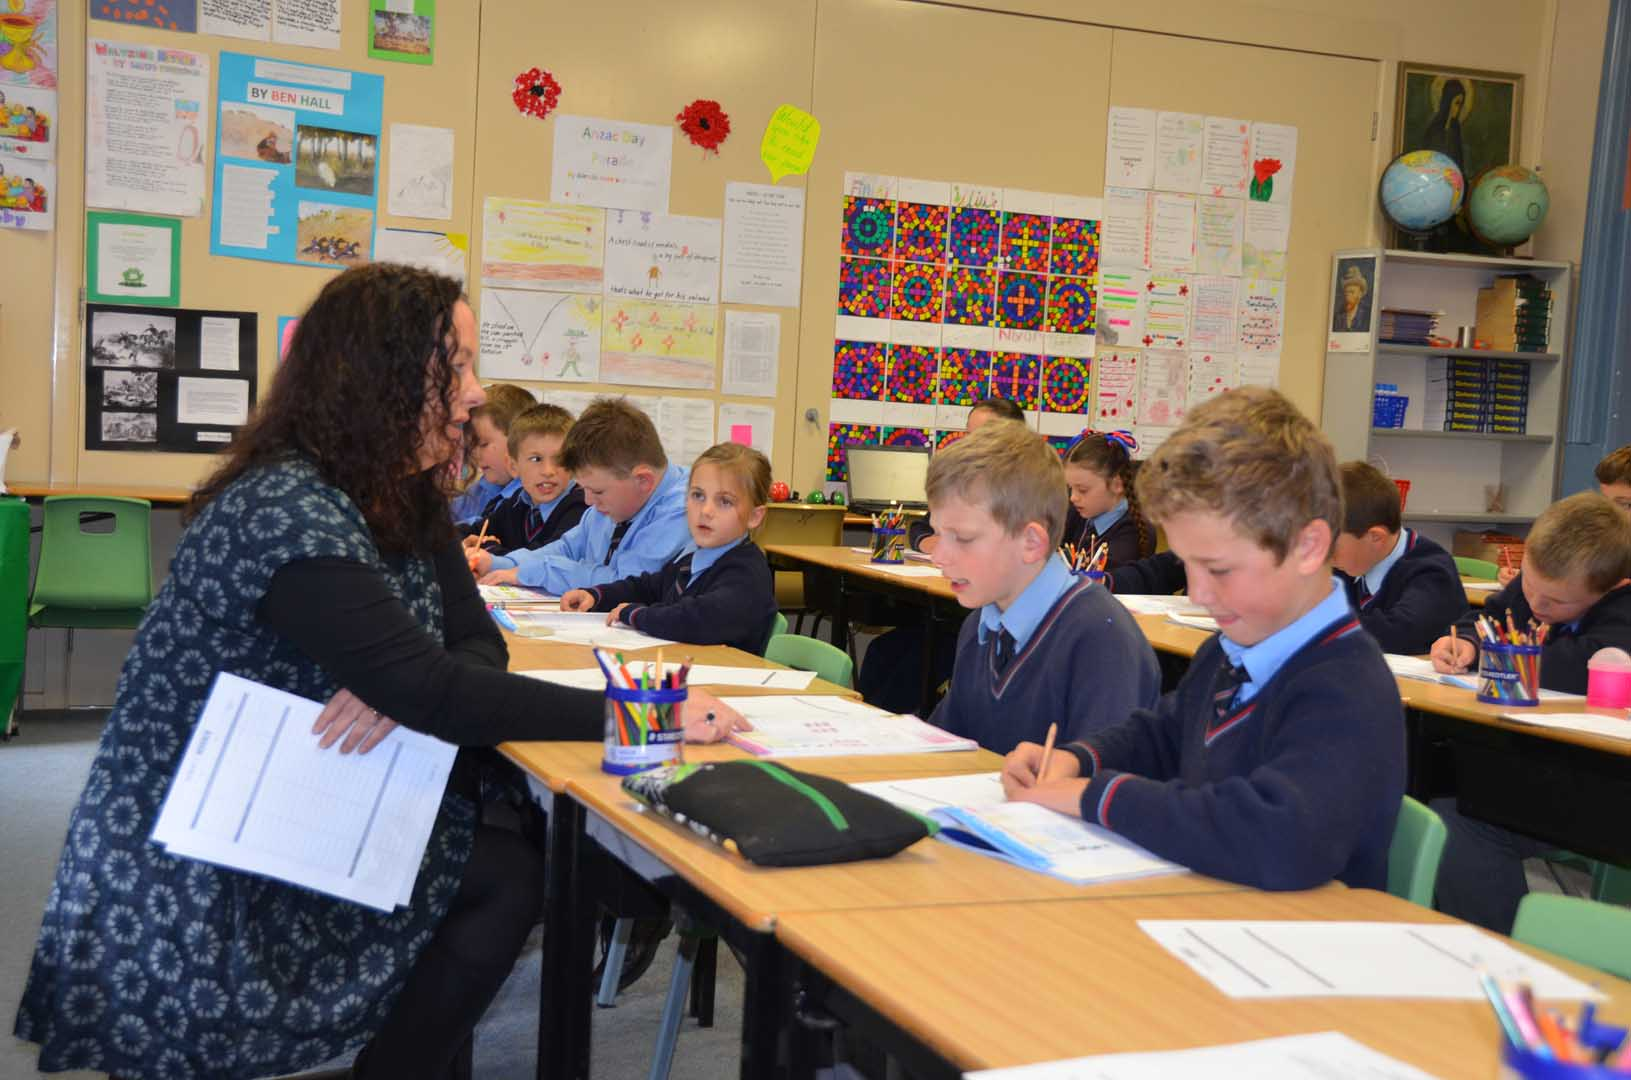 St-Patricks-walcha-classroom5